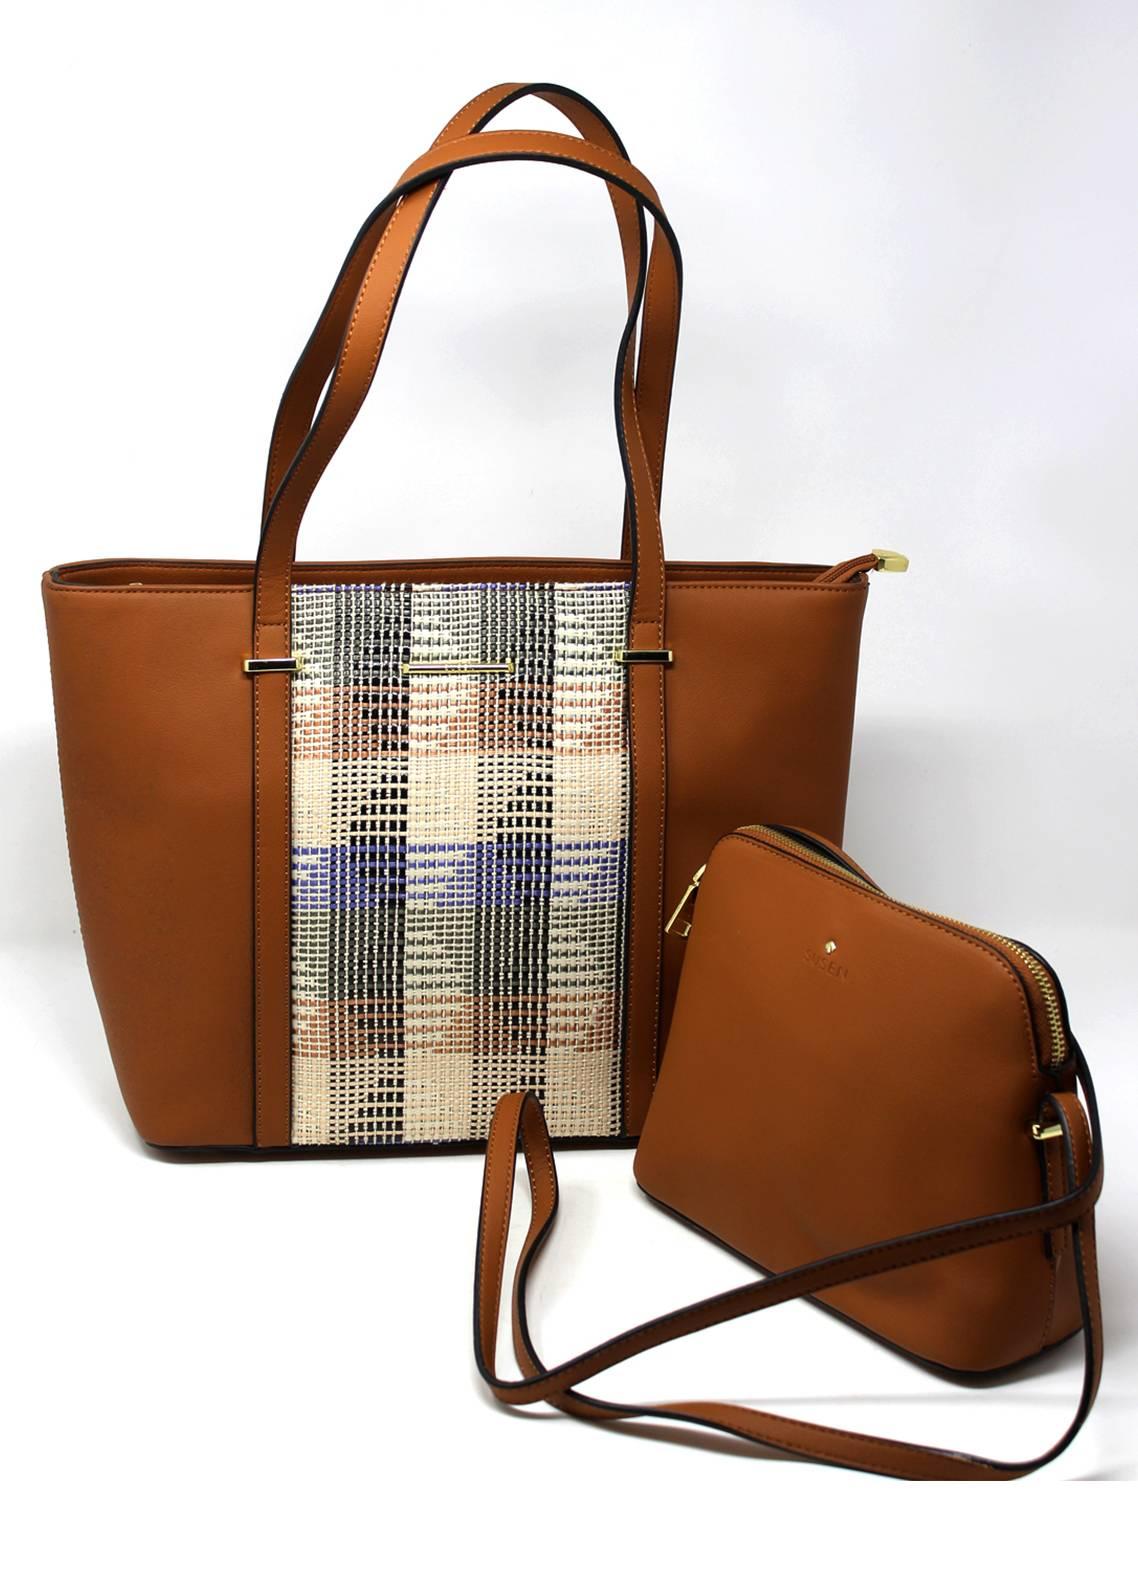 Susen PU Leather Tote  2 Piece Handbag Set for Women - Brown with Plain Pattern Design